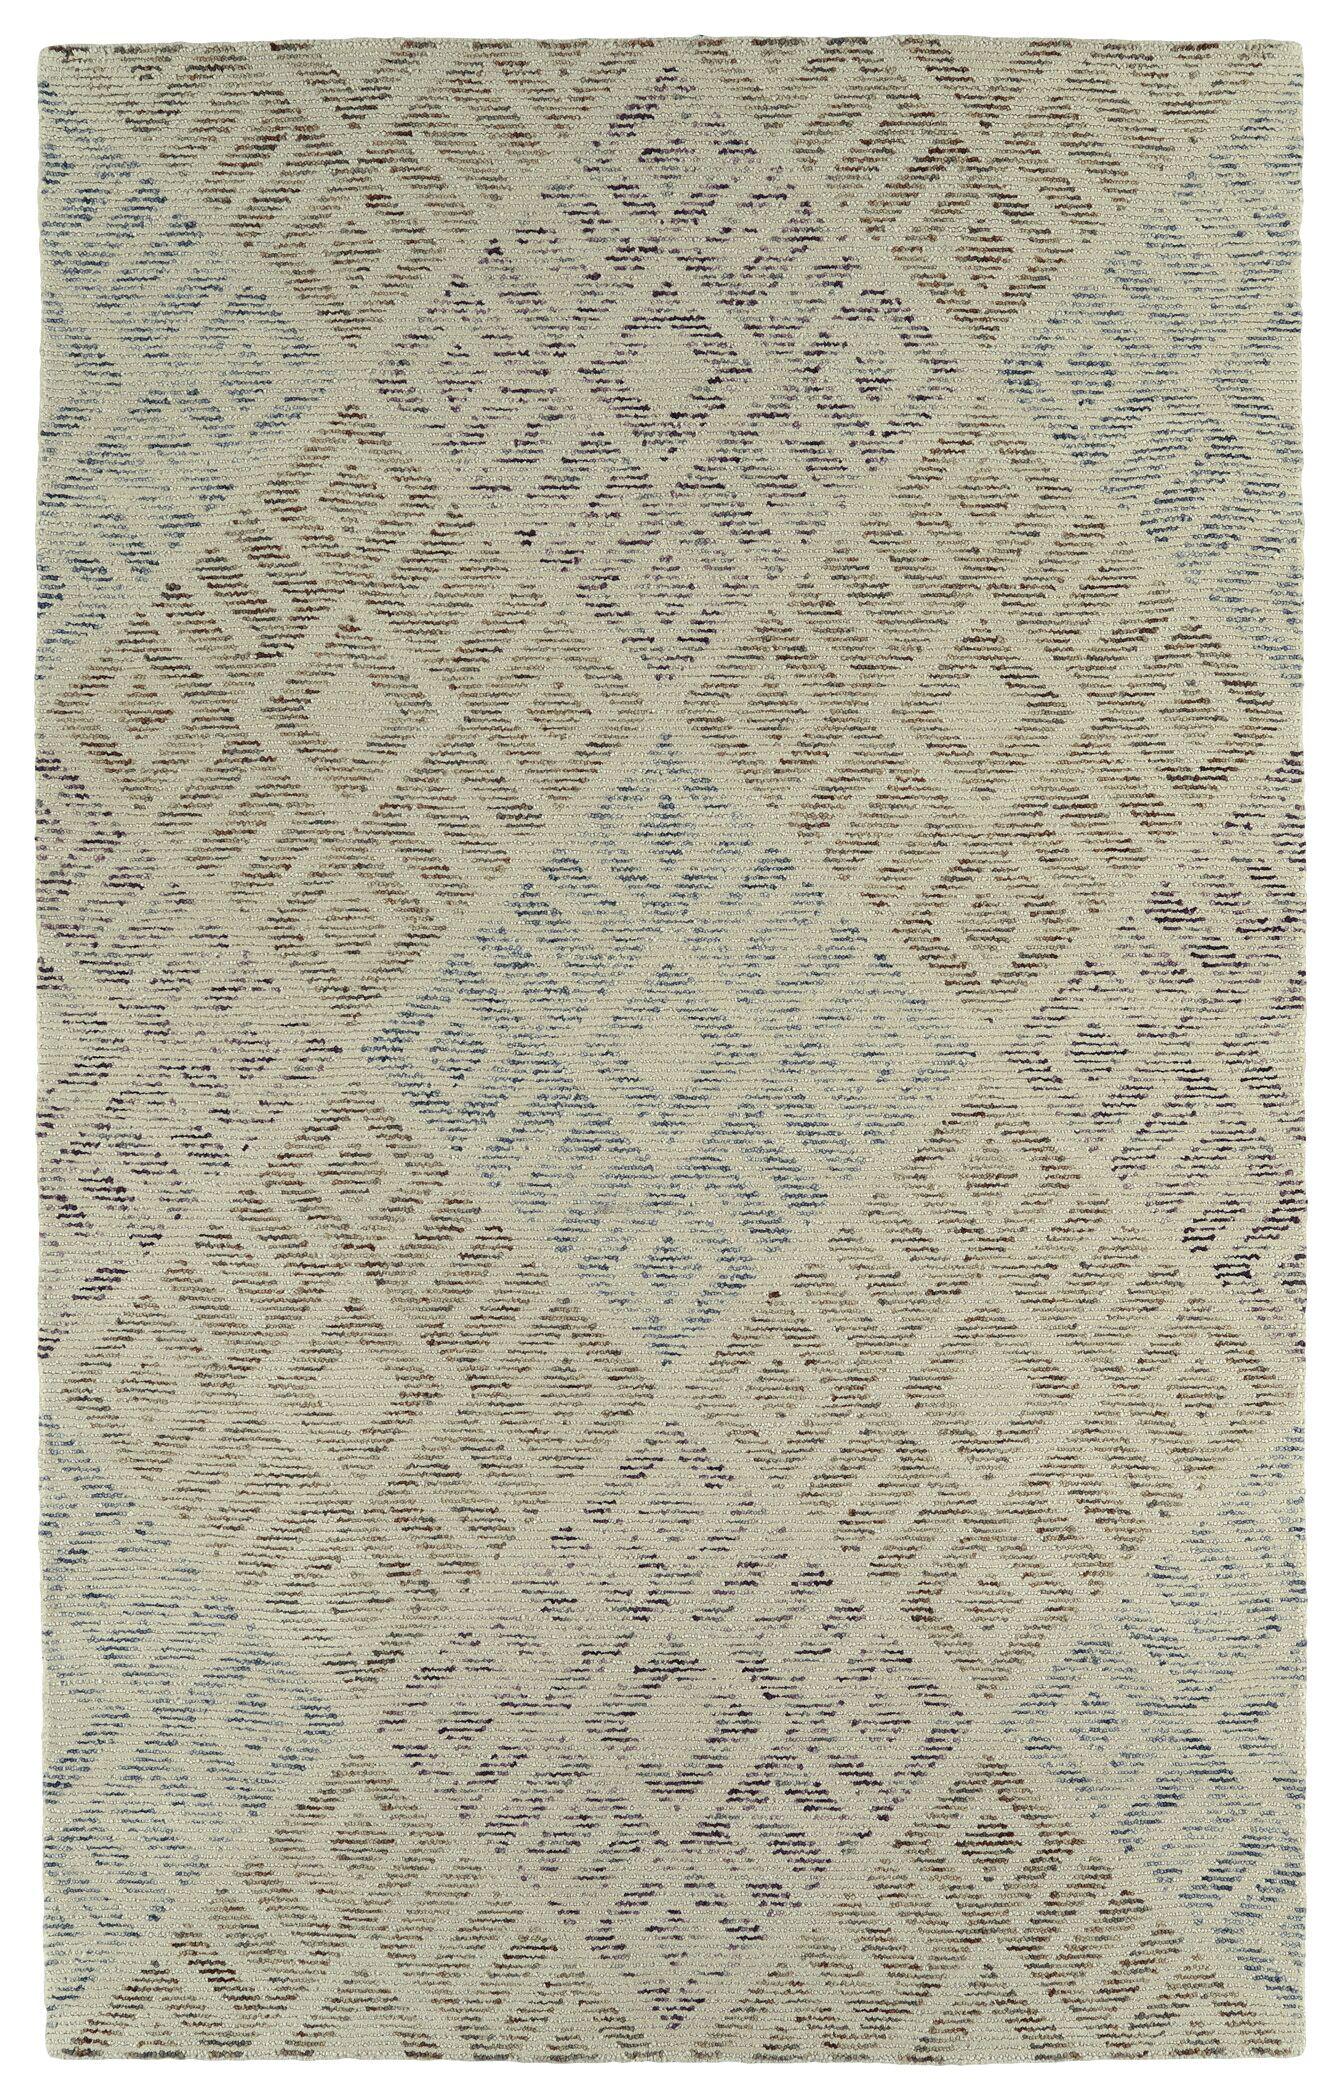 Cilegon Handmade Beige Area Rug Rug Size: Rectangle 8' x 10'